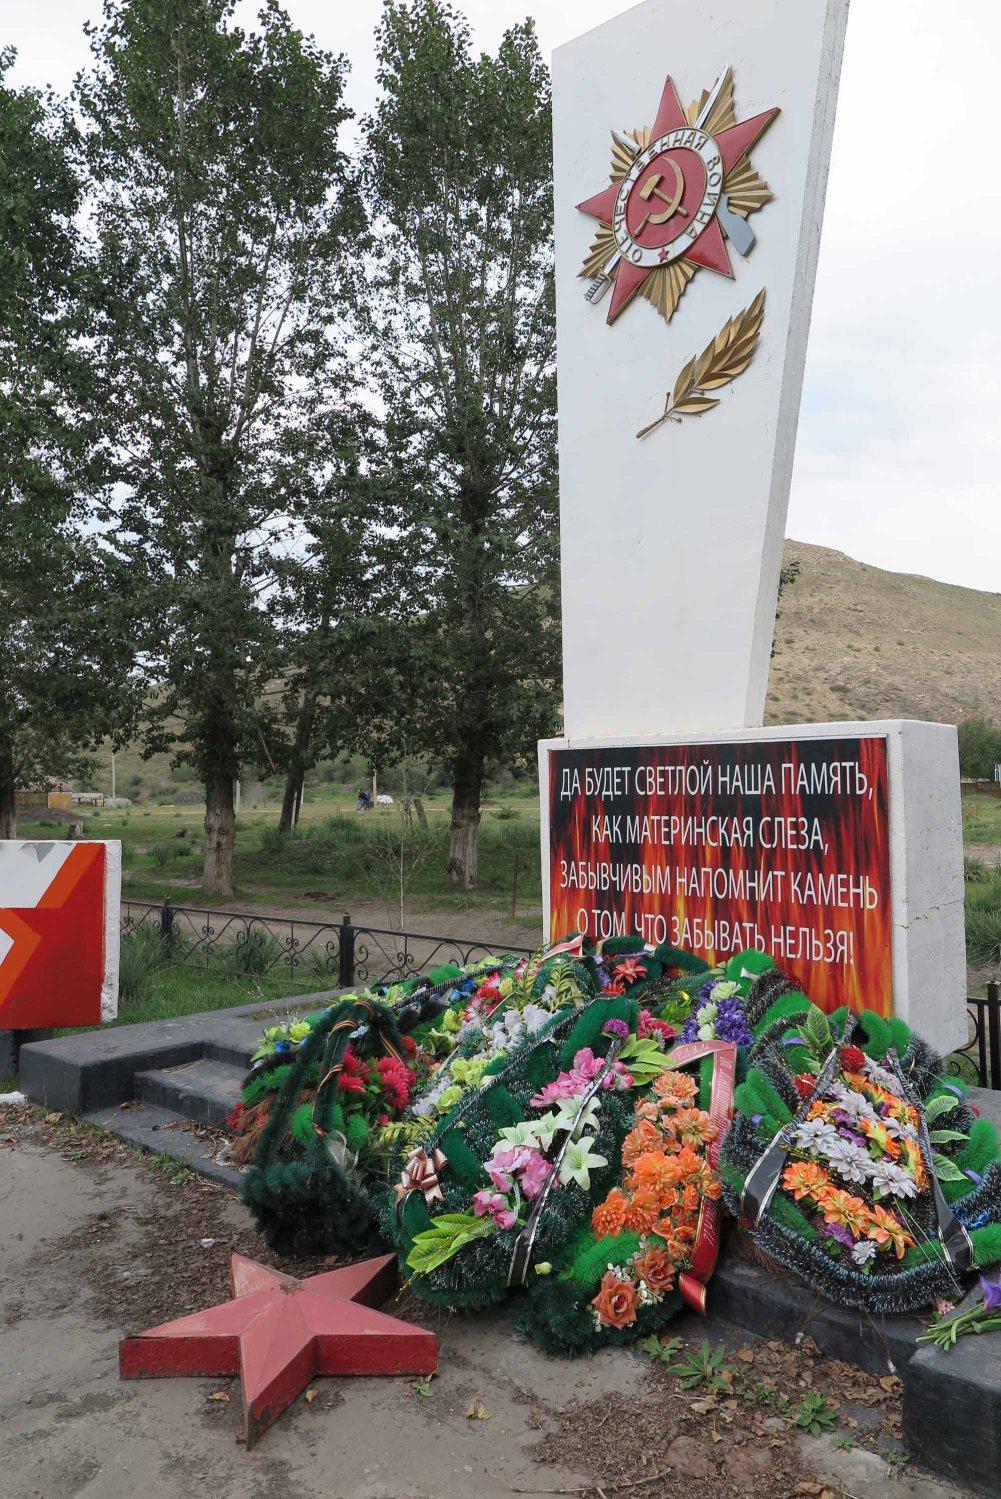 Russia-Trans-Siberian-Railway-Mongolian-Leg-War-Memorial